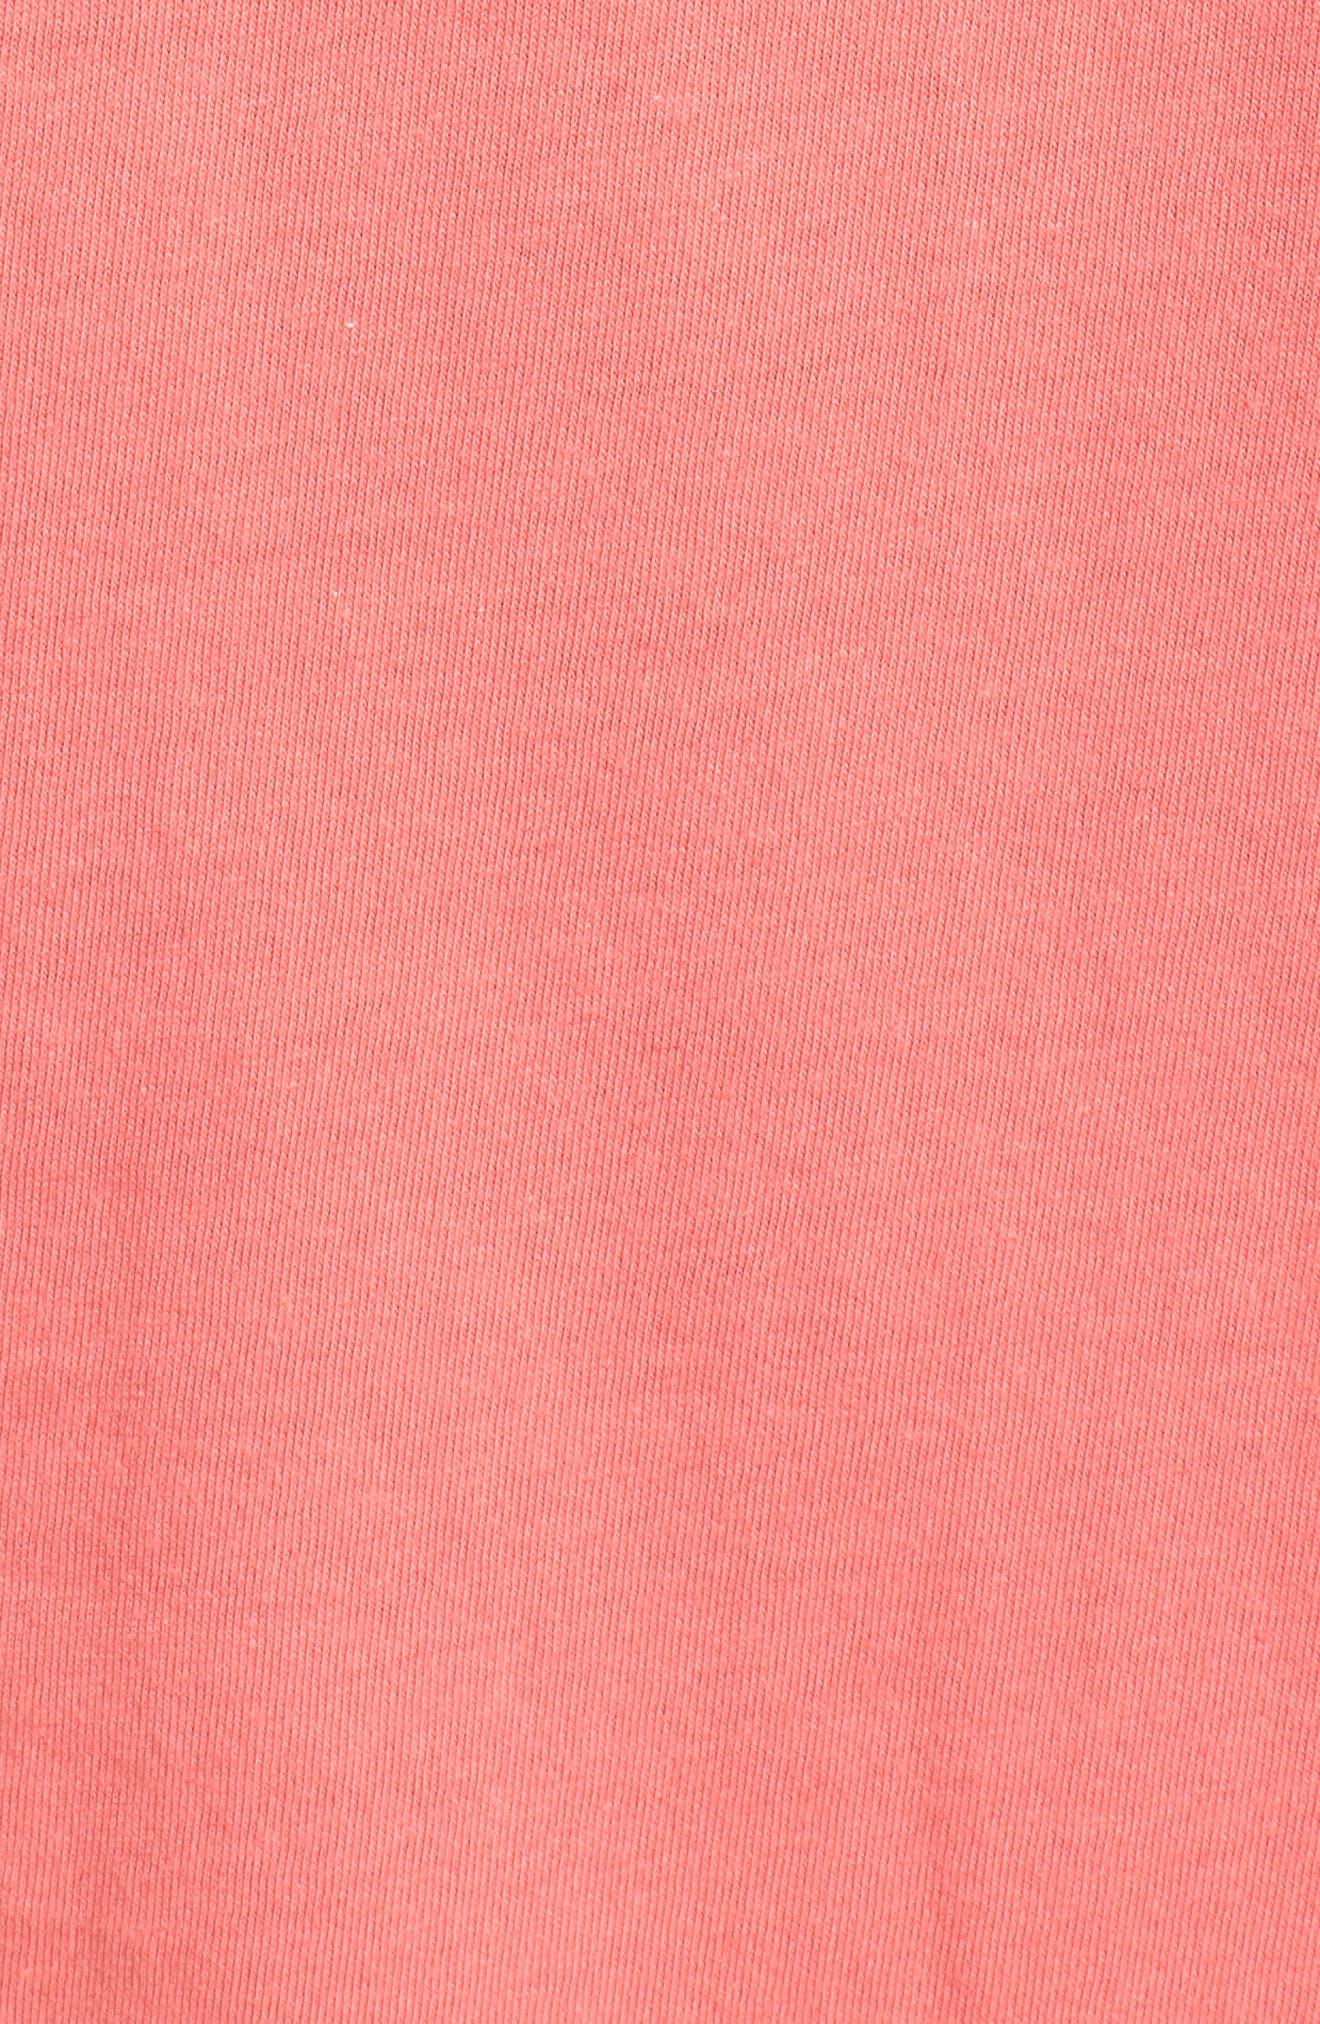 Zoit Graphic T-Shirt,                             Alternate thumbnail 5, color,                             CORAL ZOIT